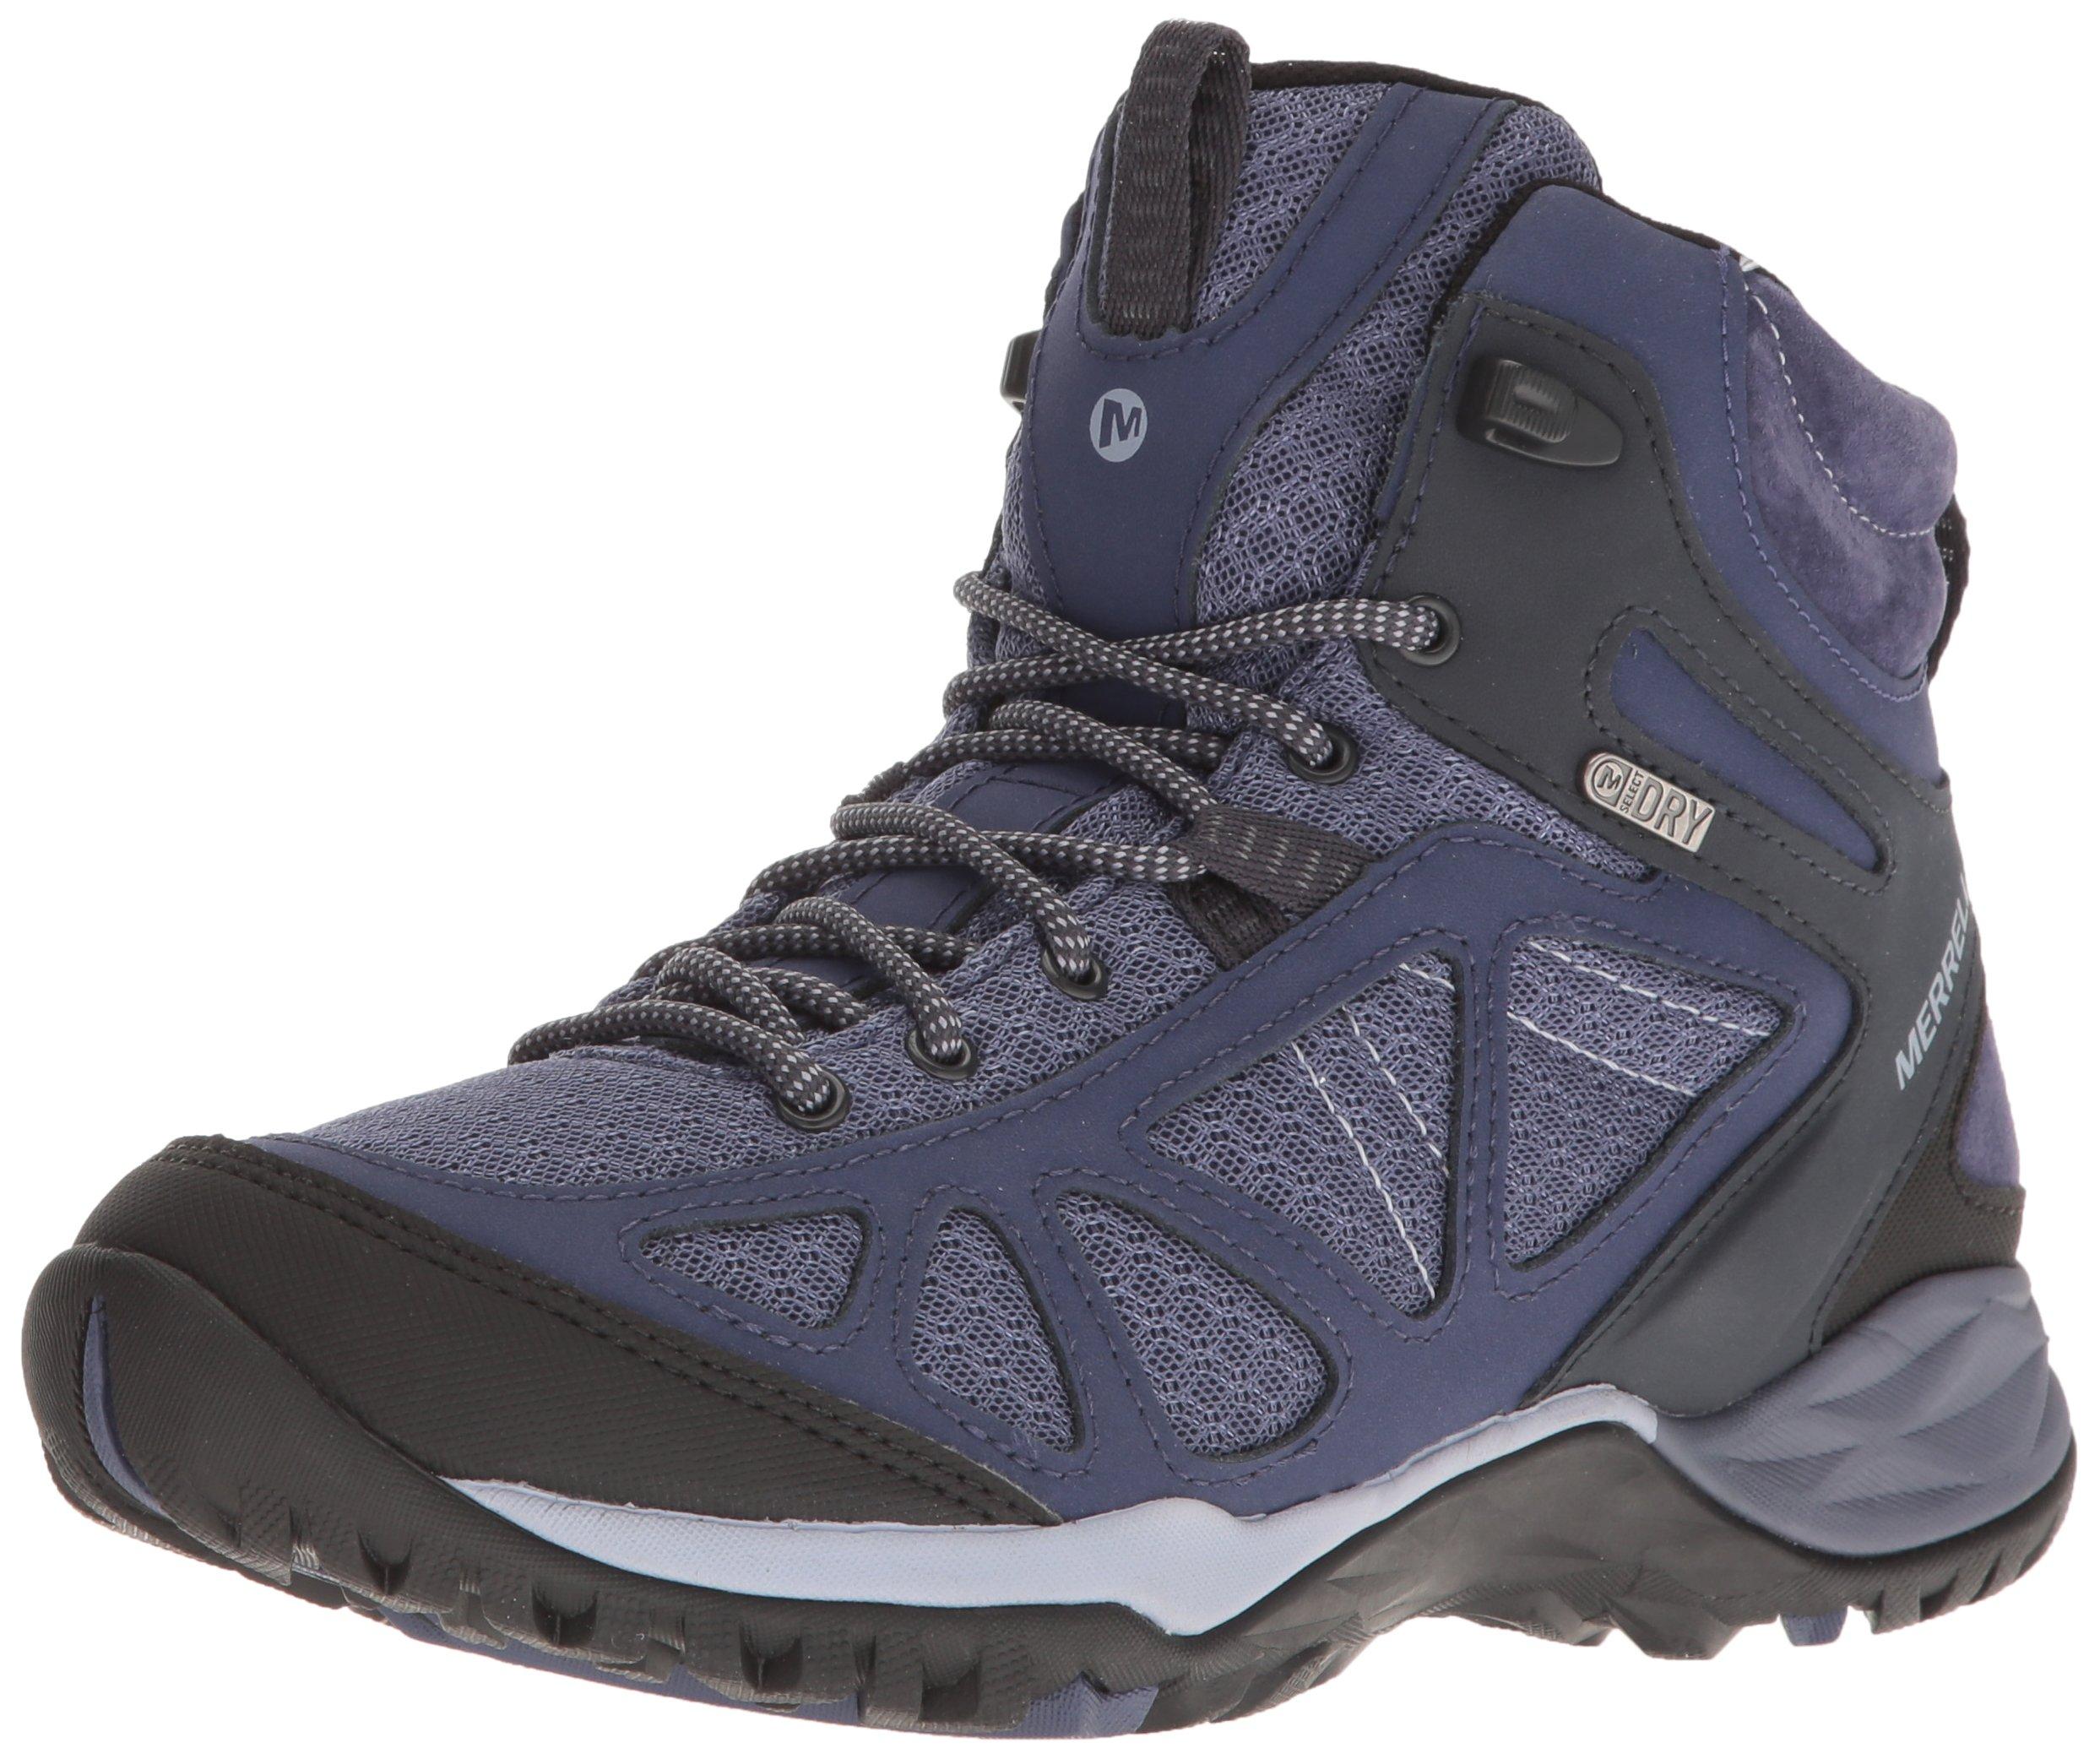 Merrell Women's Siren Sport Q2 Mid Waterproof Hiking Boot, Crown Blue, 9 M US